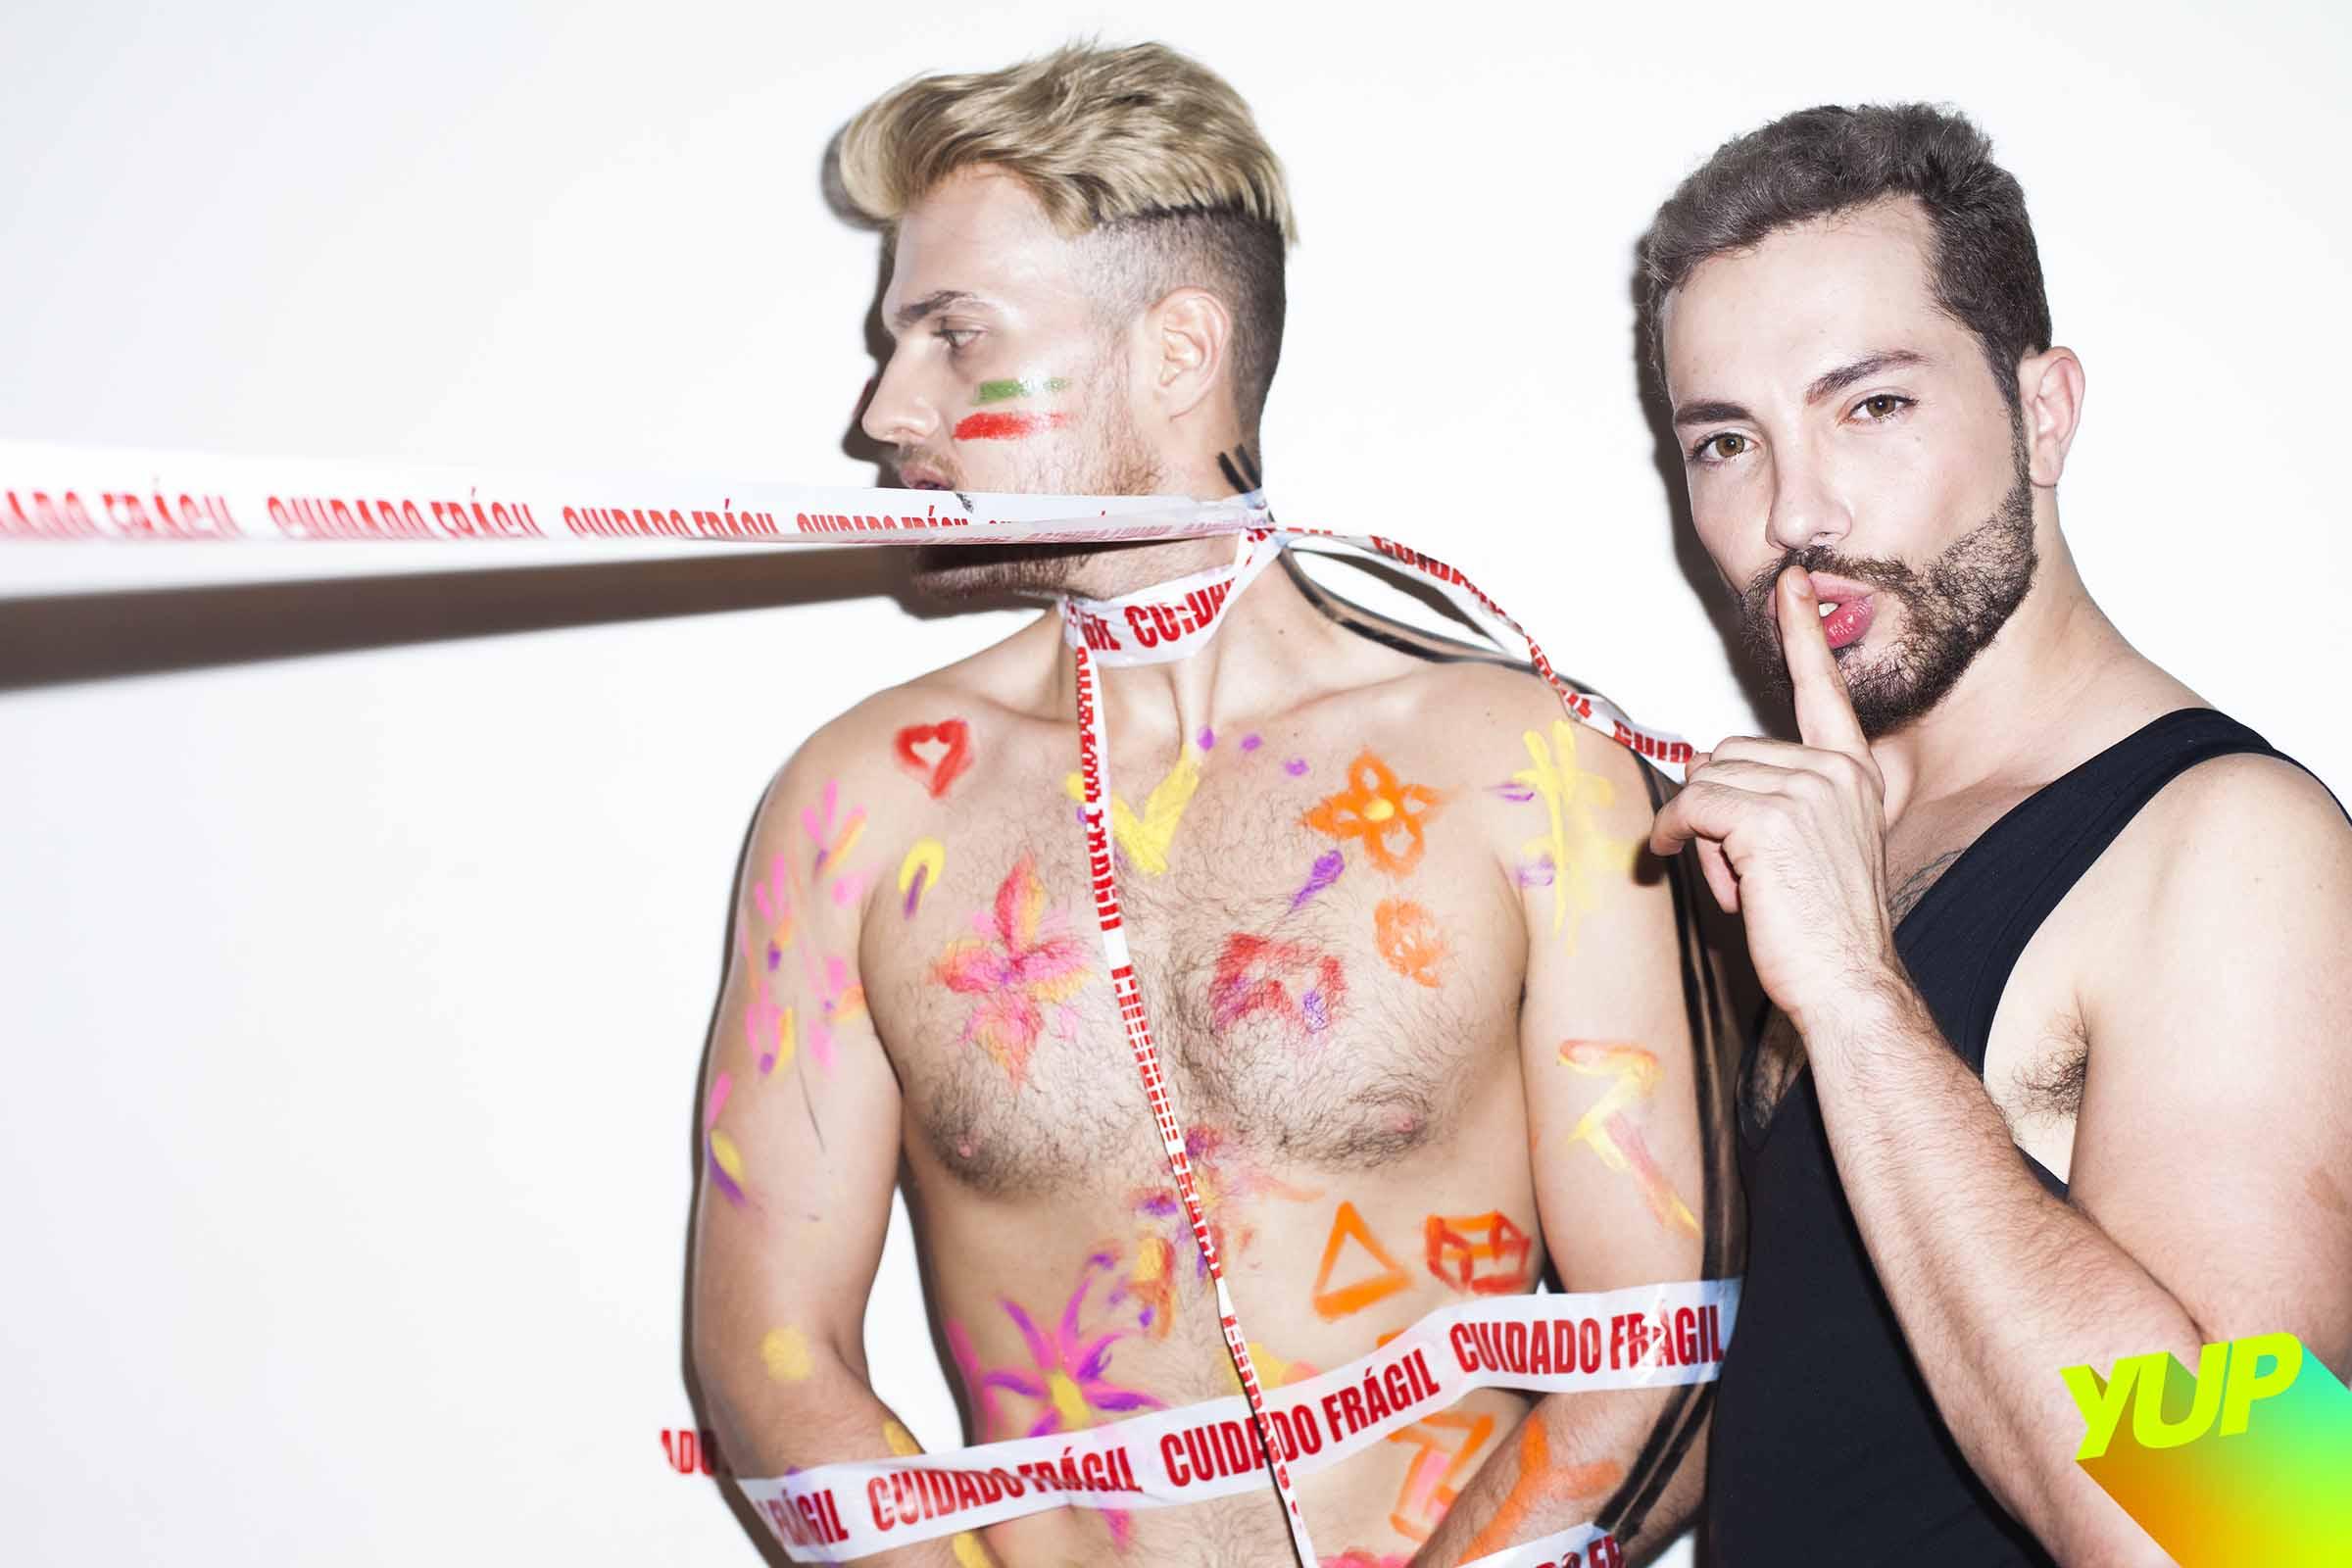 Davi Alvarez & Alex Almeida X Emerson Muniz X YUP Magazine EXCLUSIVE